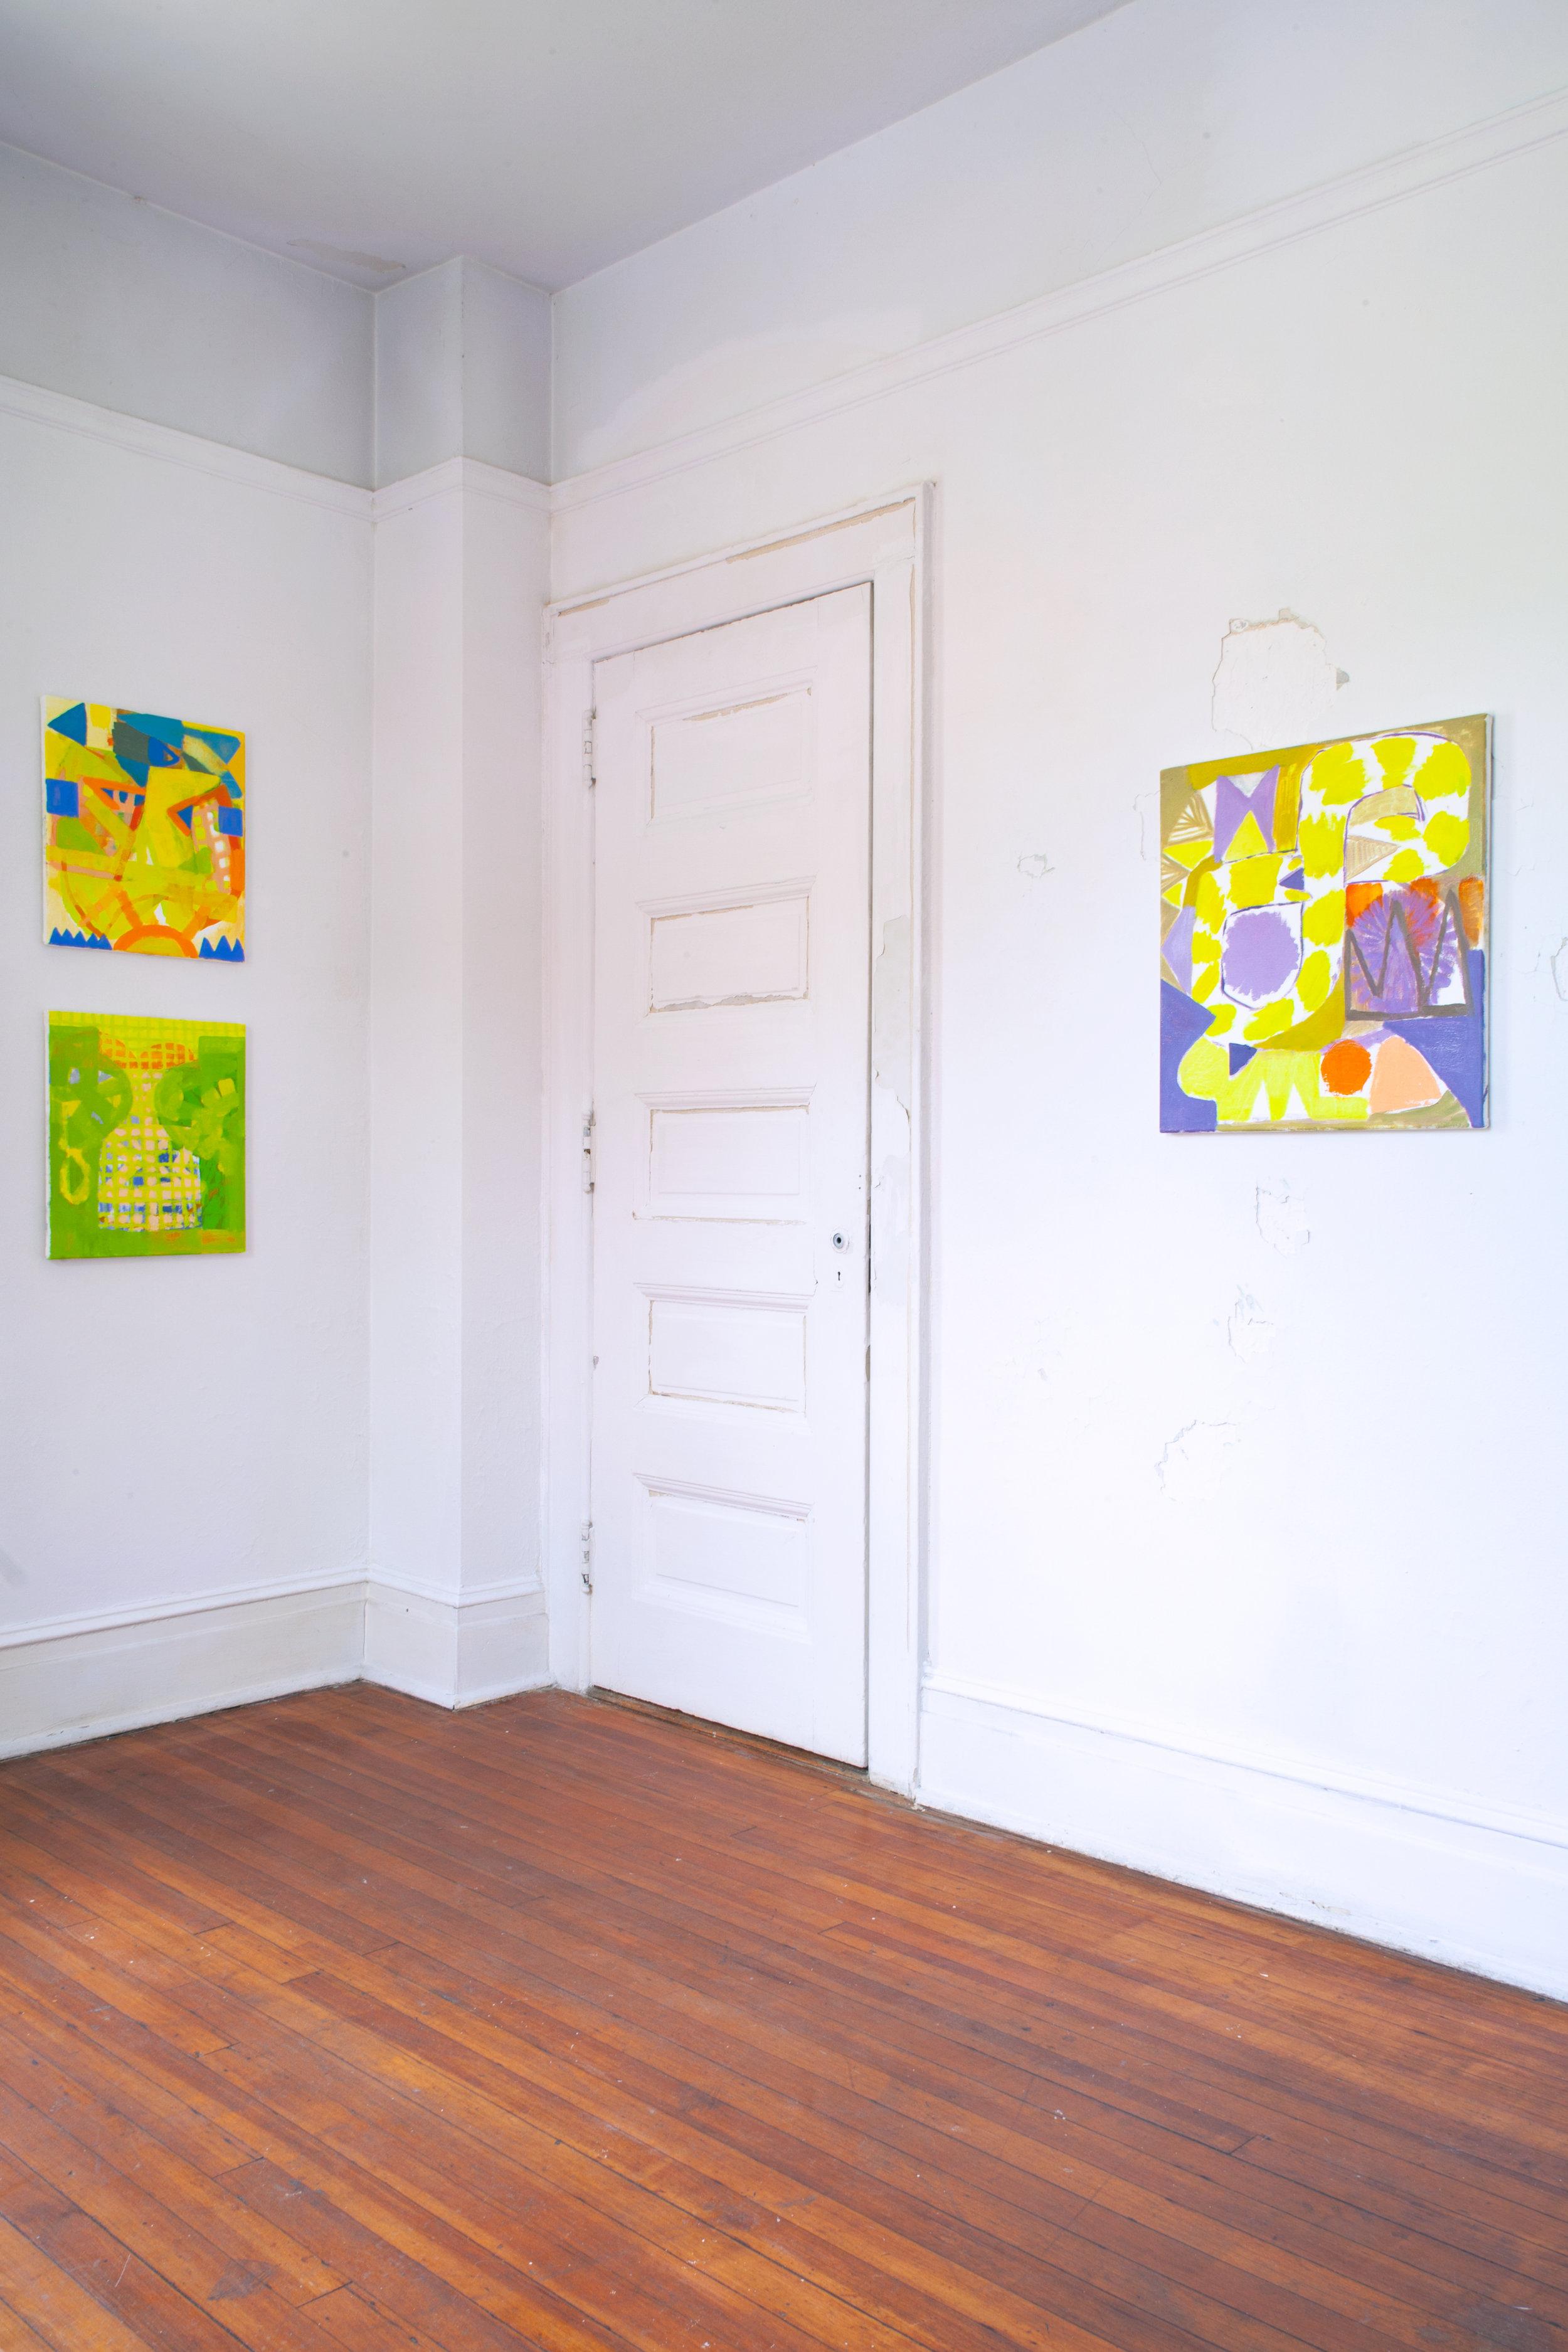 Meghan_Brady-NADA_House-2019-installation_view_02.jpg